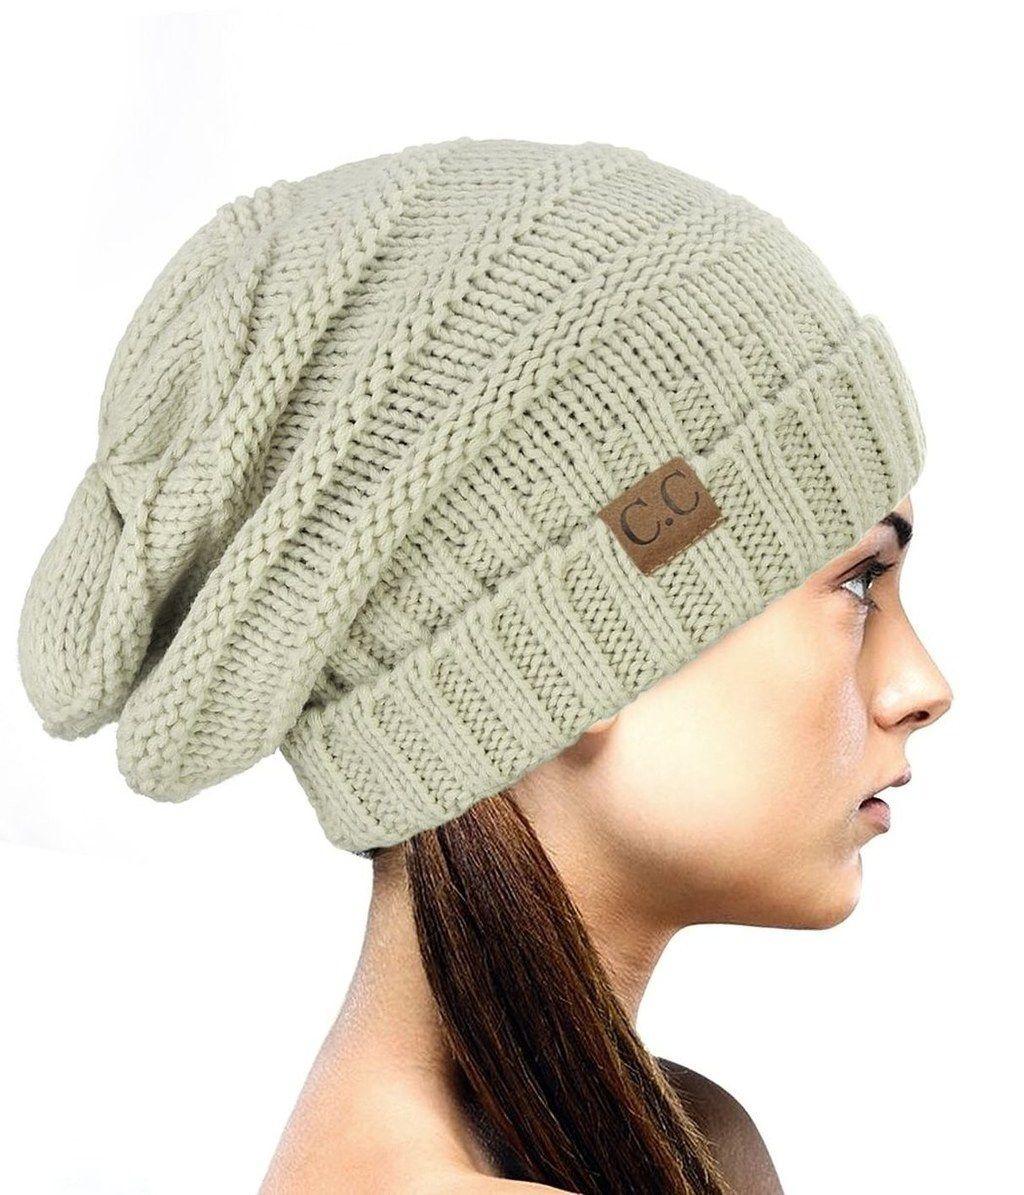 81f1768e1bf68 Women s Knit Striped Beard Mustache Removeable Face Mask Warmer Hat Beanie  Cap